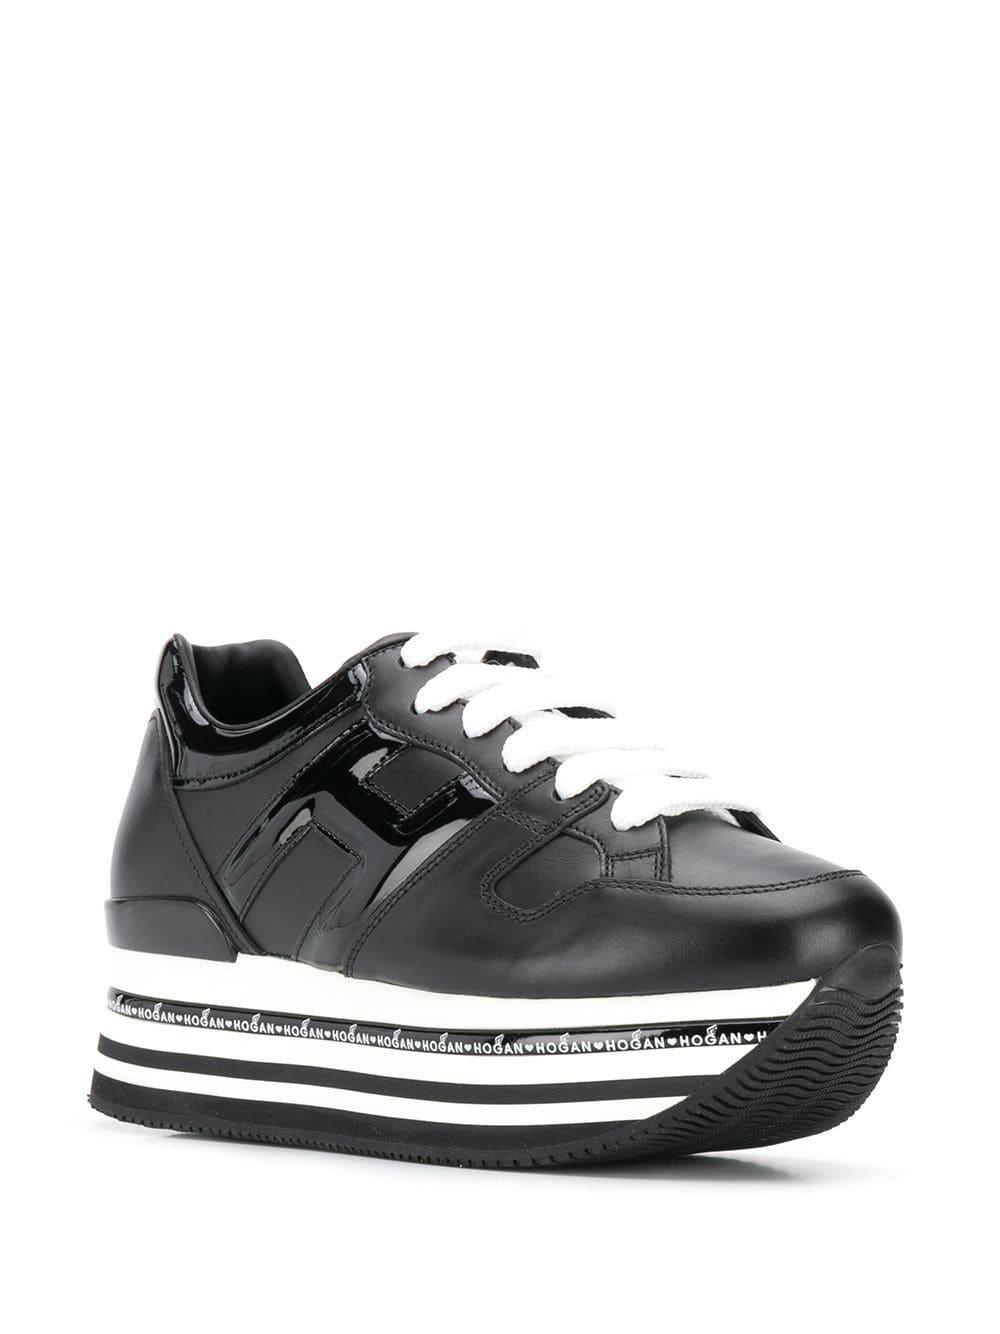 a09f67425b0 Lyst - Hogan Striped Platform Sneakers in Black